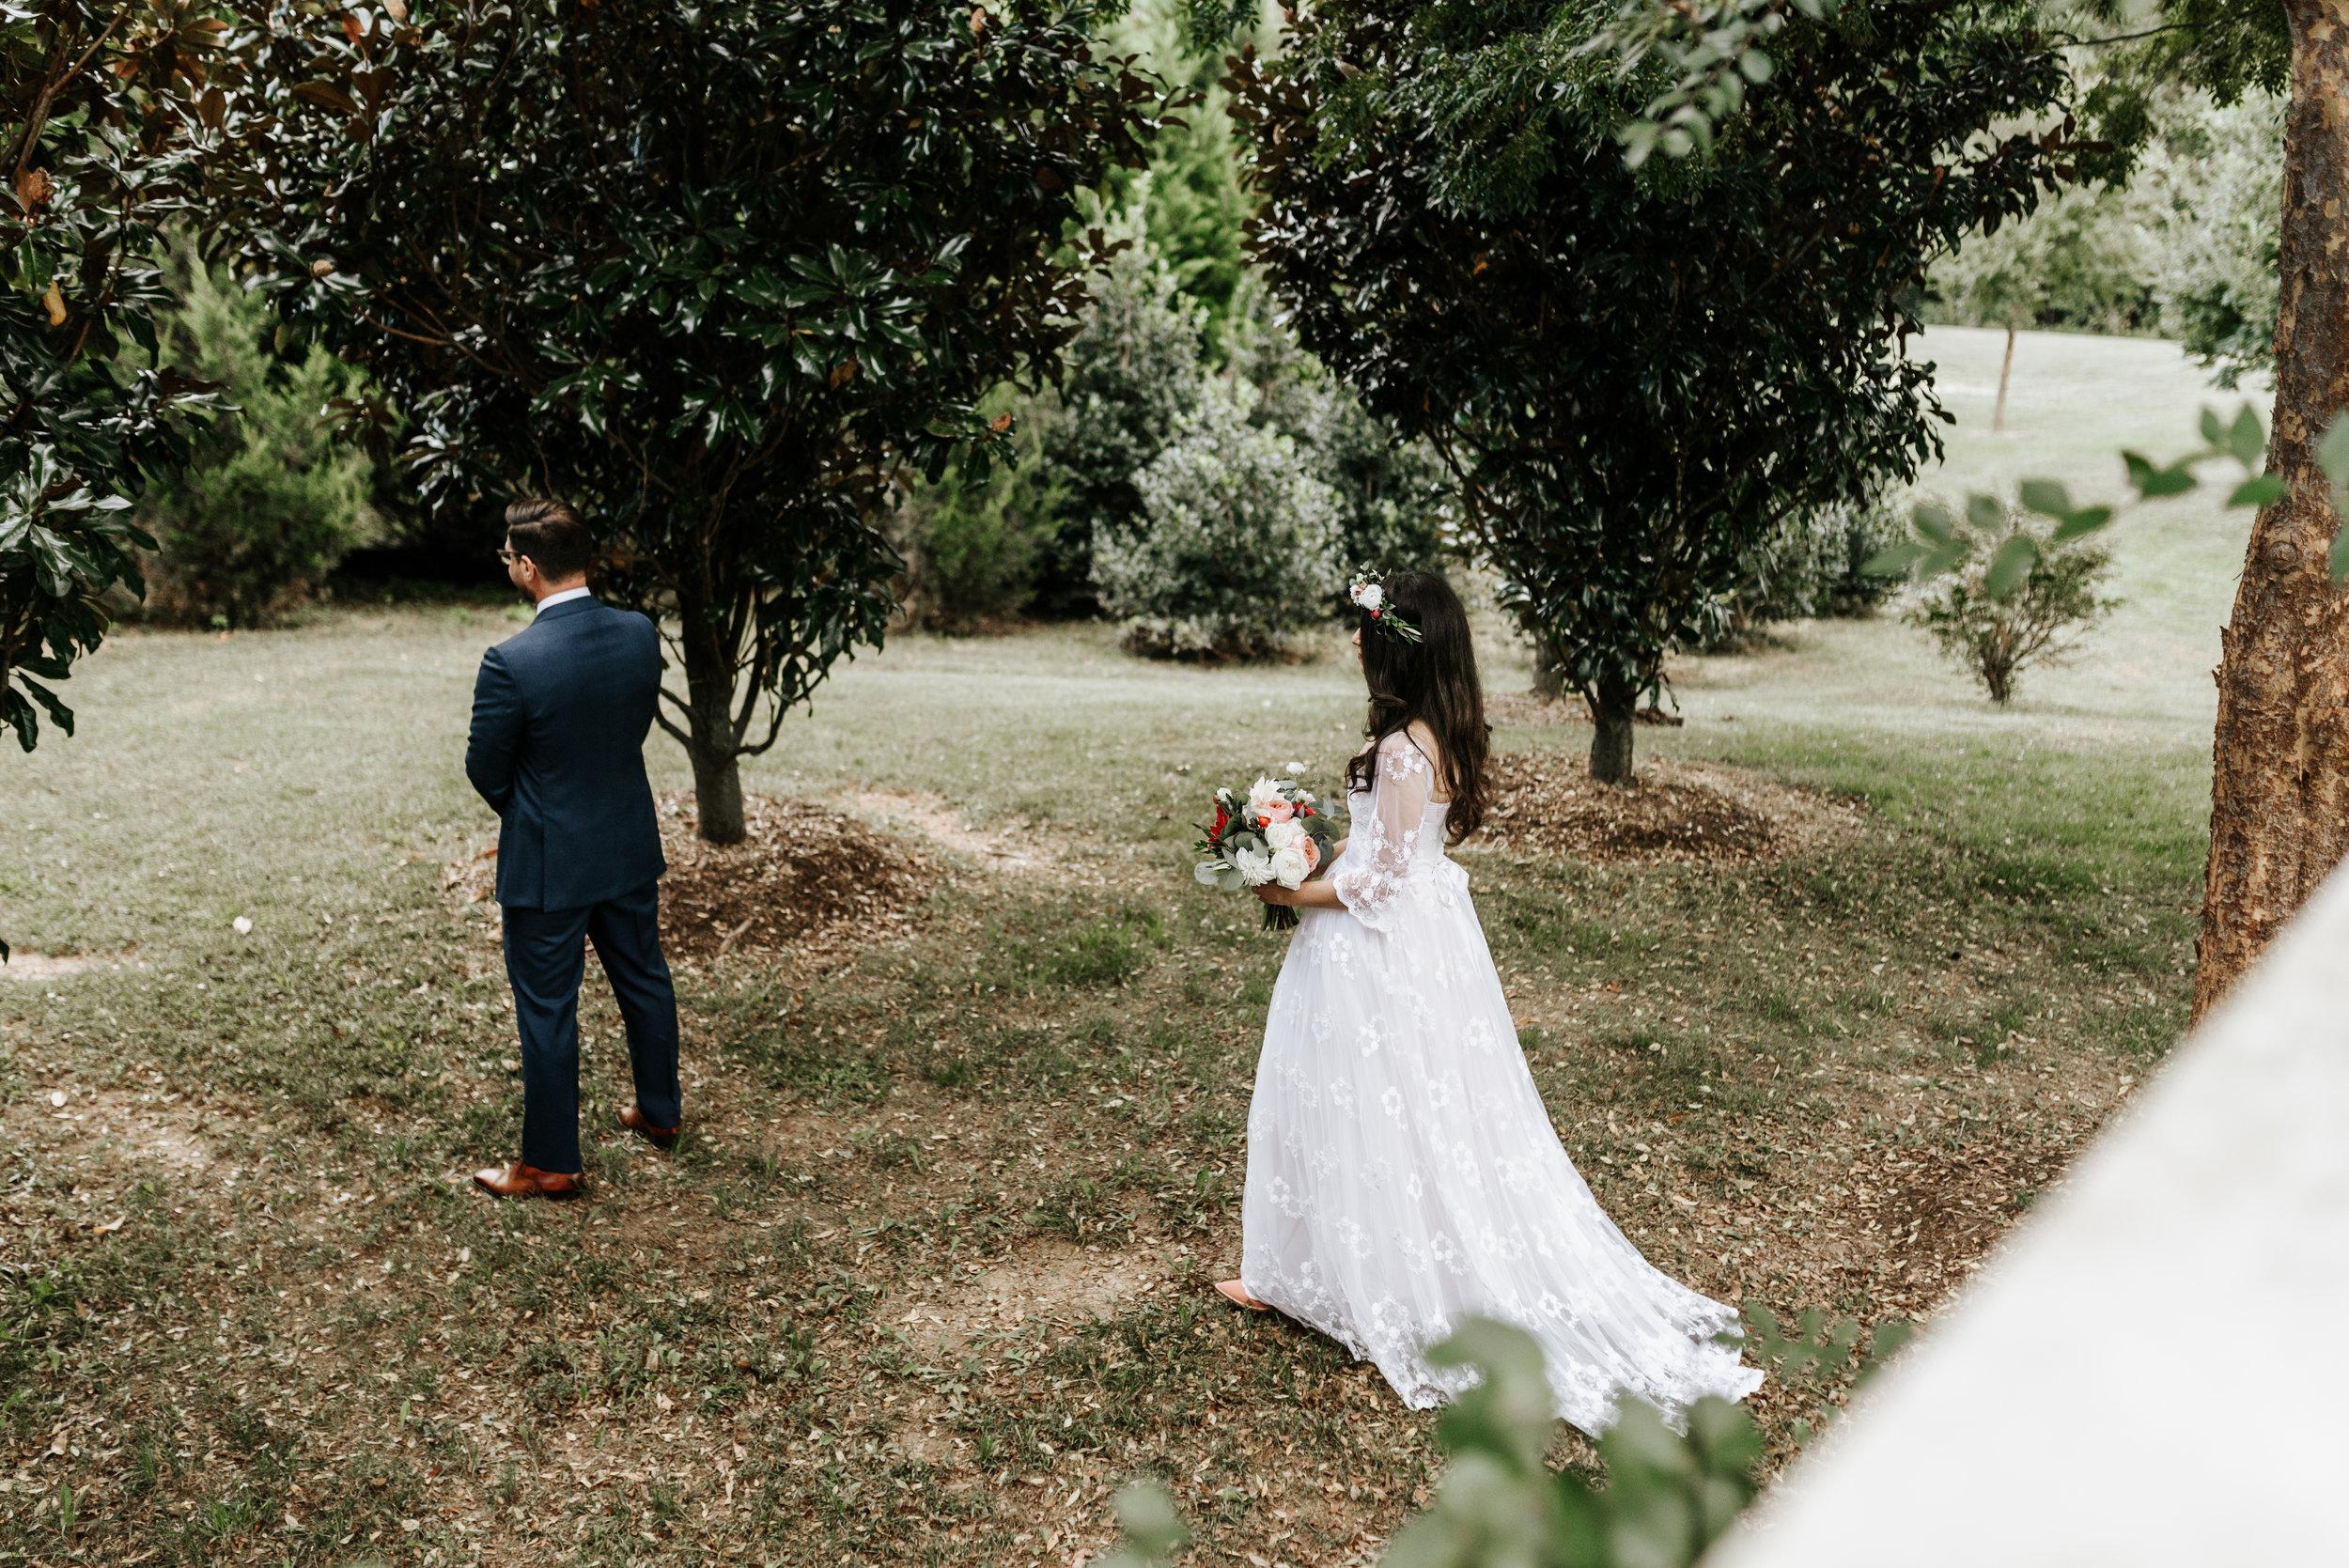 Veritas-Vineyards-and-Winery-Wedding-Photography-Afton-Virginia-Yasmin-Seth-Photography-by-V-9237.jpg